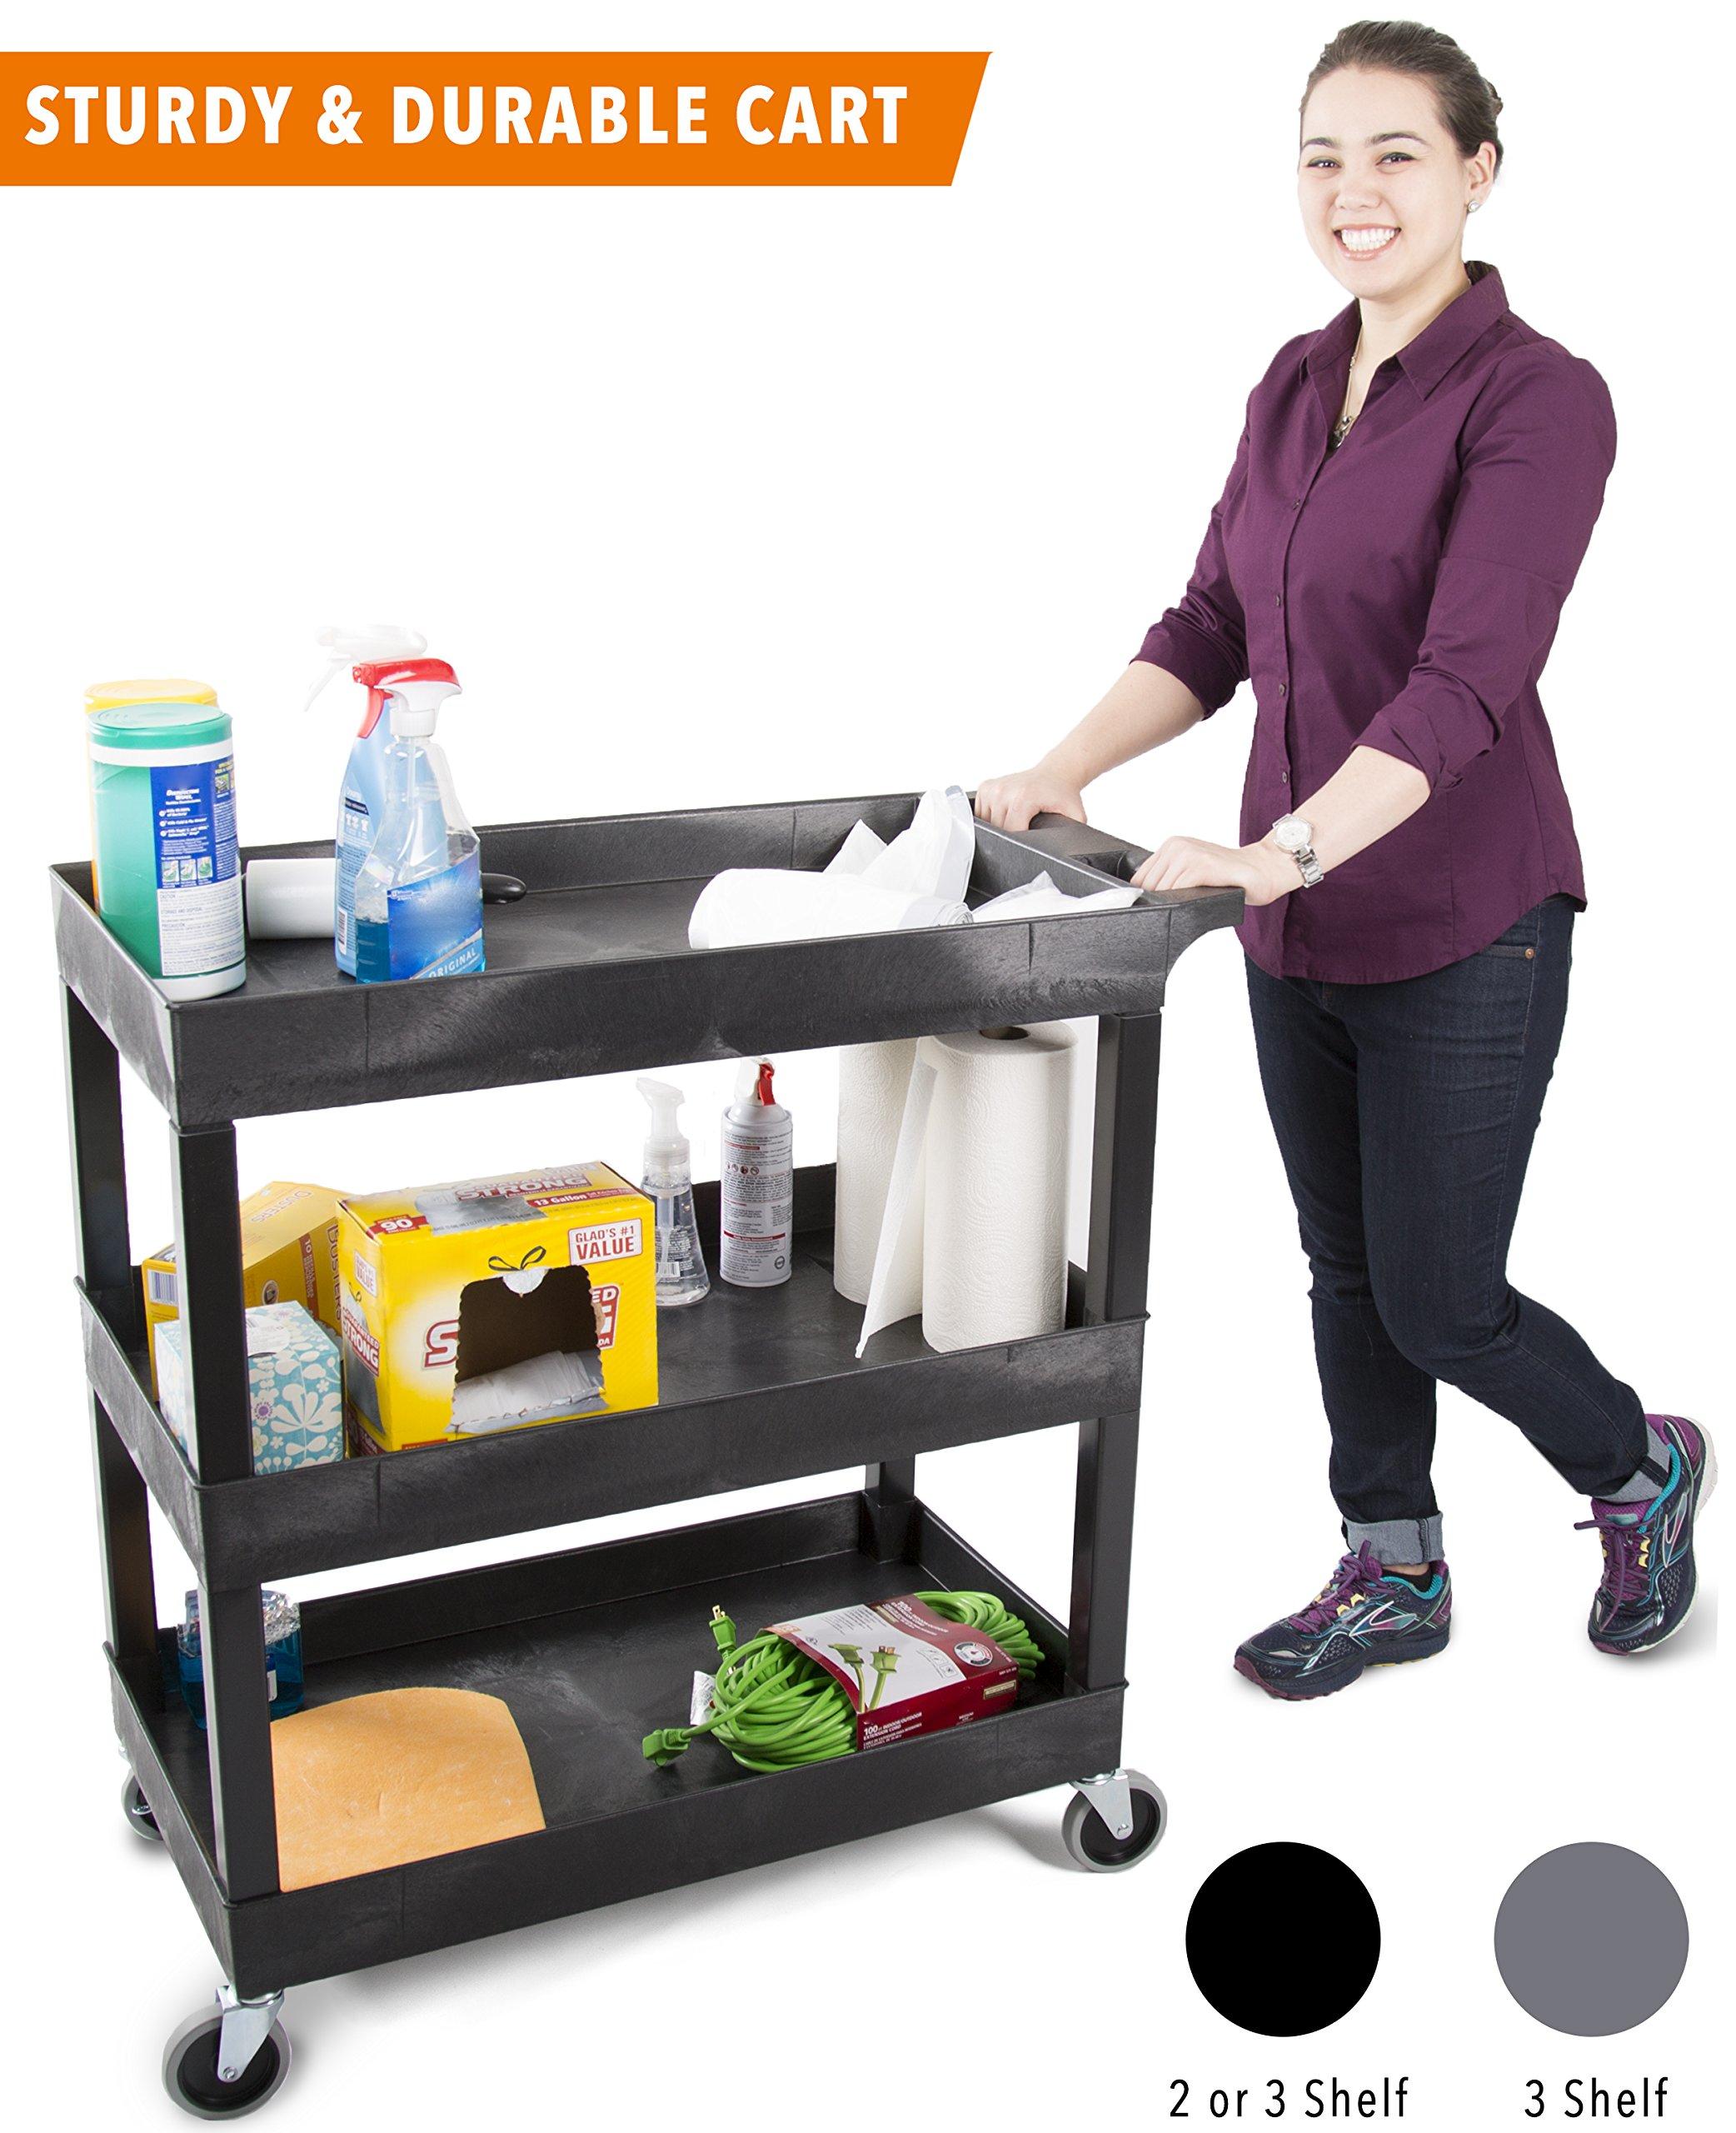 Original Tubster - Shelf Utility Cart/Service Cart - Heavy Duty - Supports up to 400 lbs! - Tub Carts & Deep Shelves (Three Shelf Black)